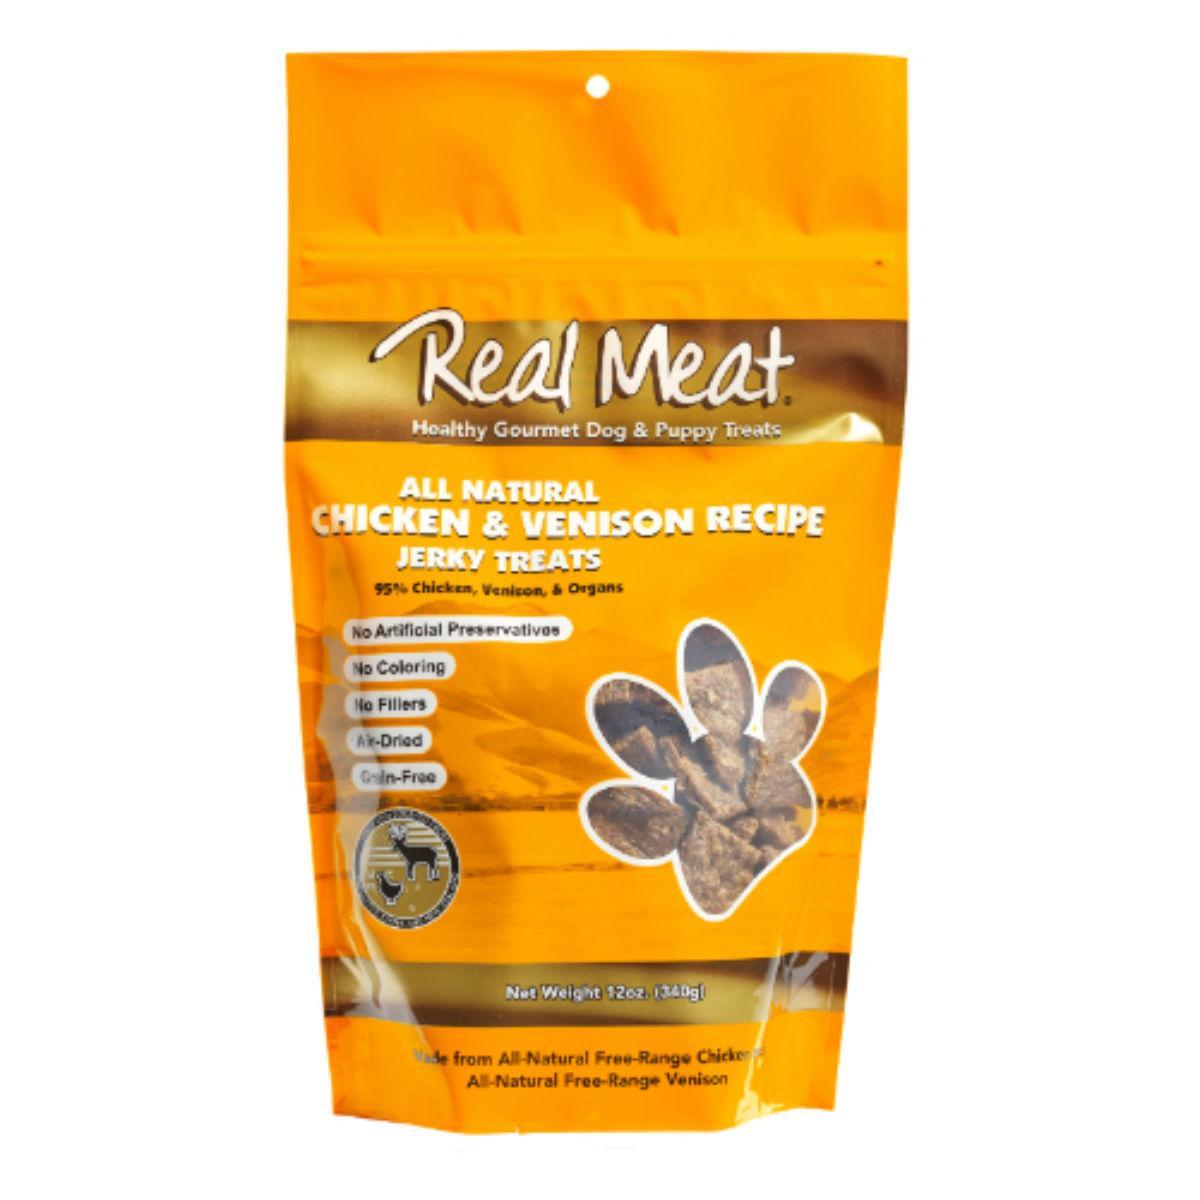 Real Meat Chicken & Venison Bitz Jerky Dog Treats